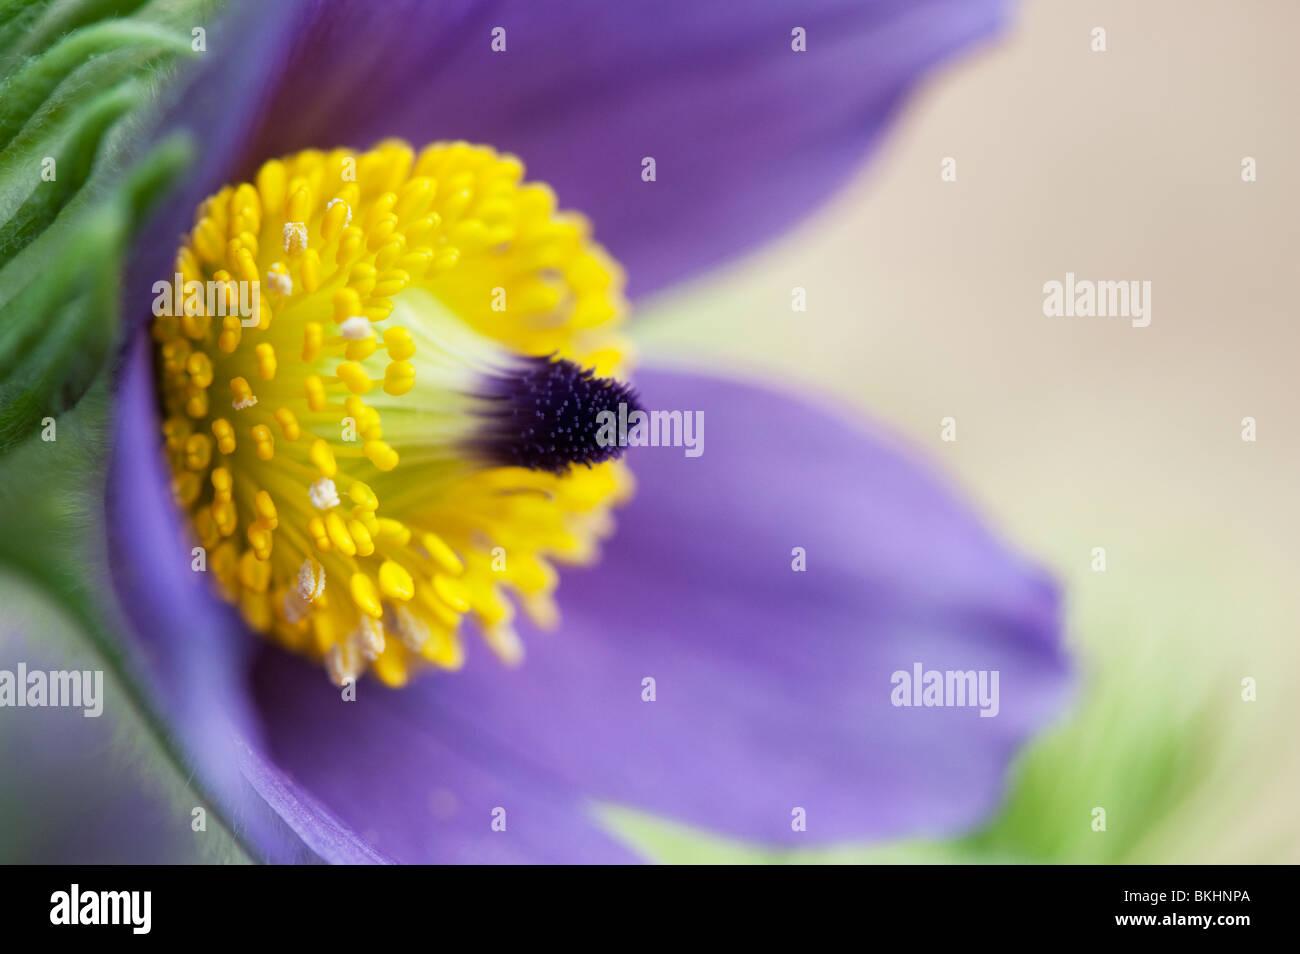 Pulsatilla Vulgaris. Pasque flower - Stock Image